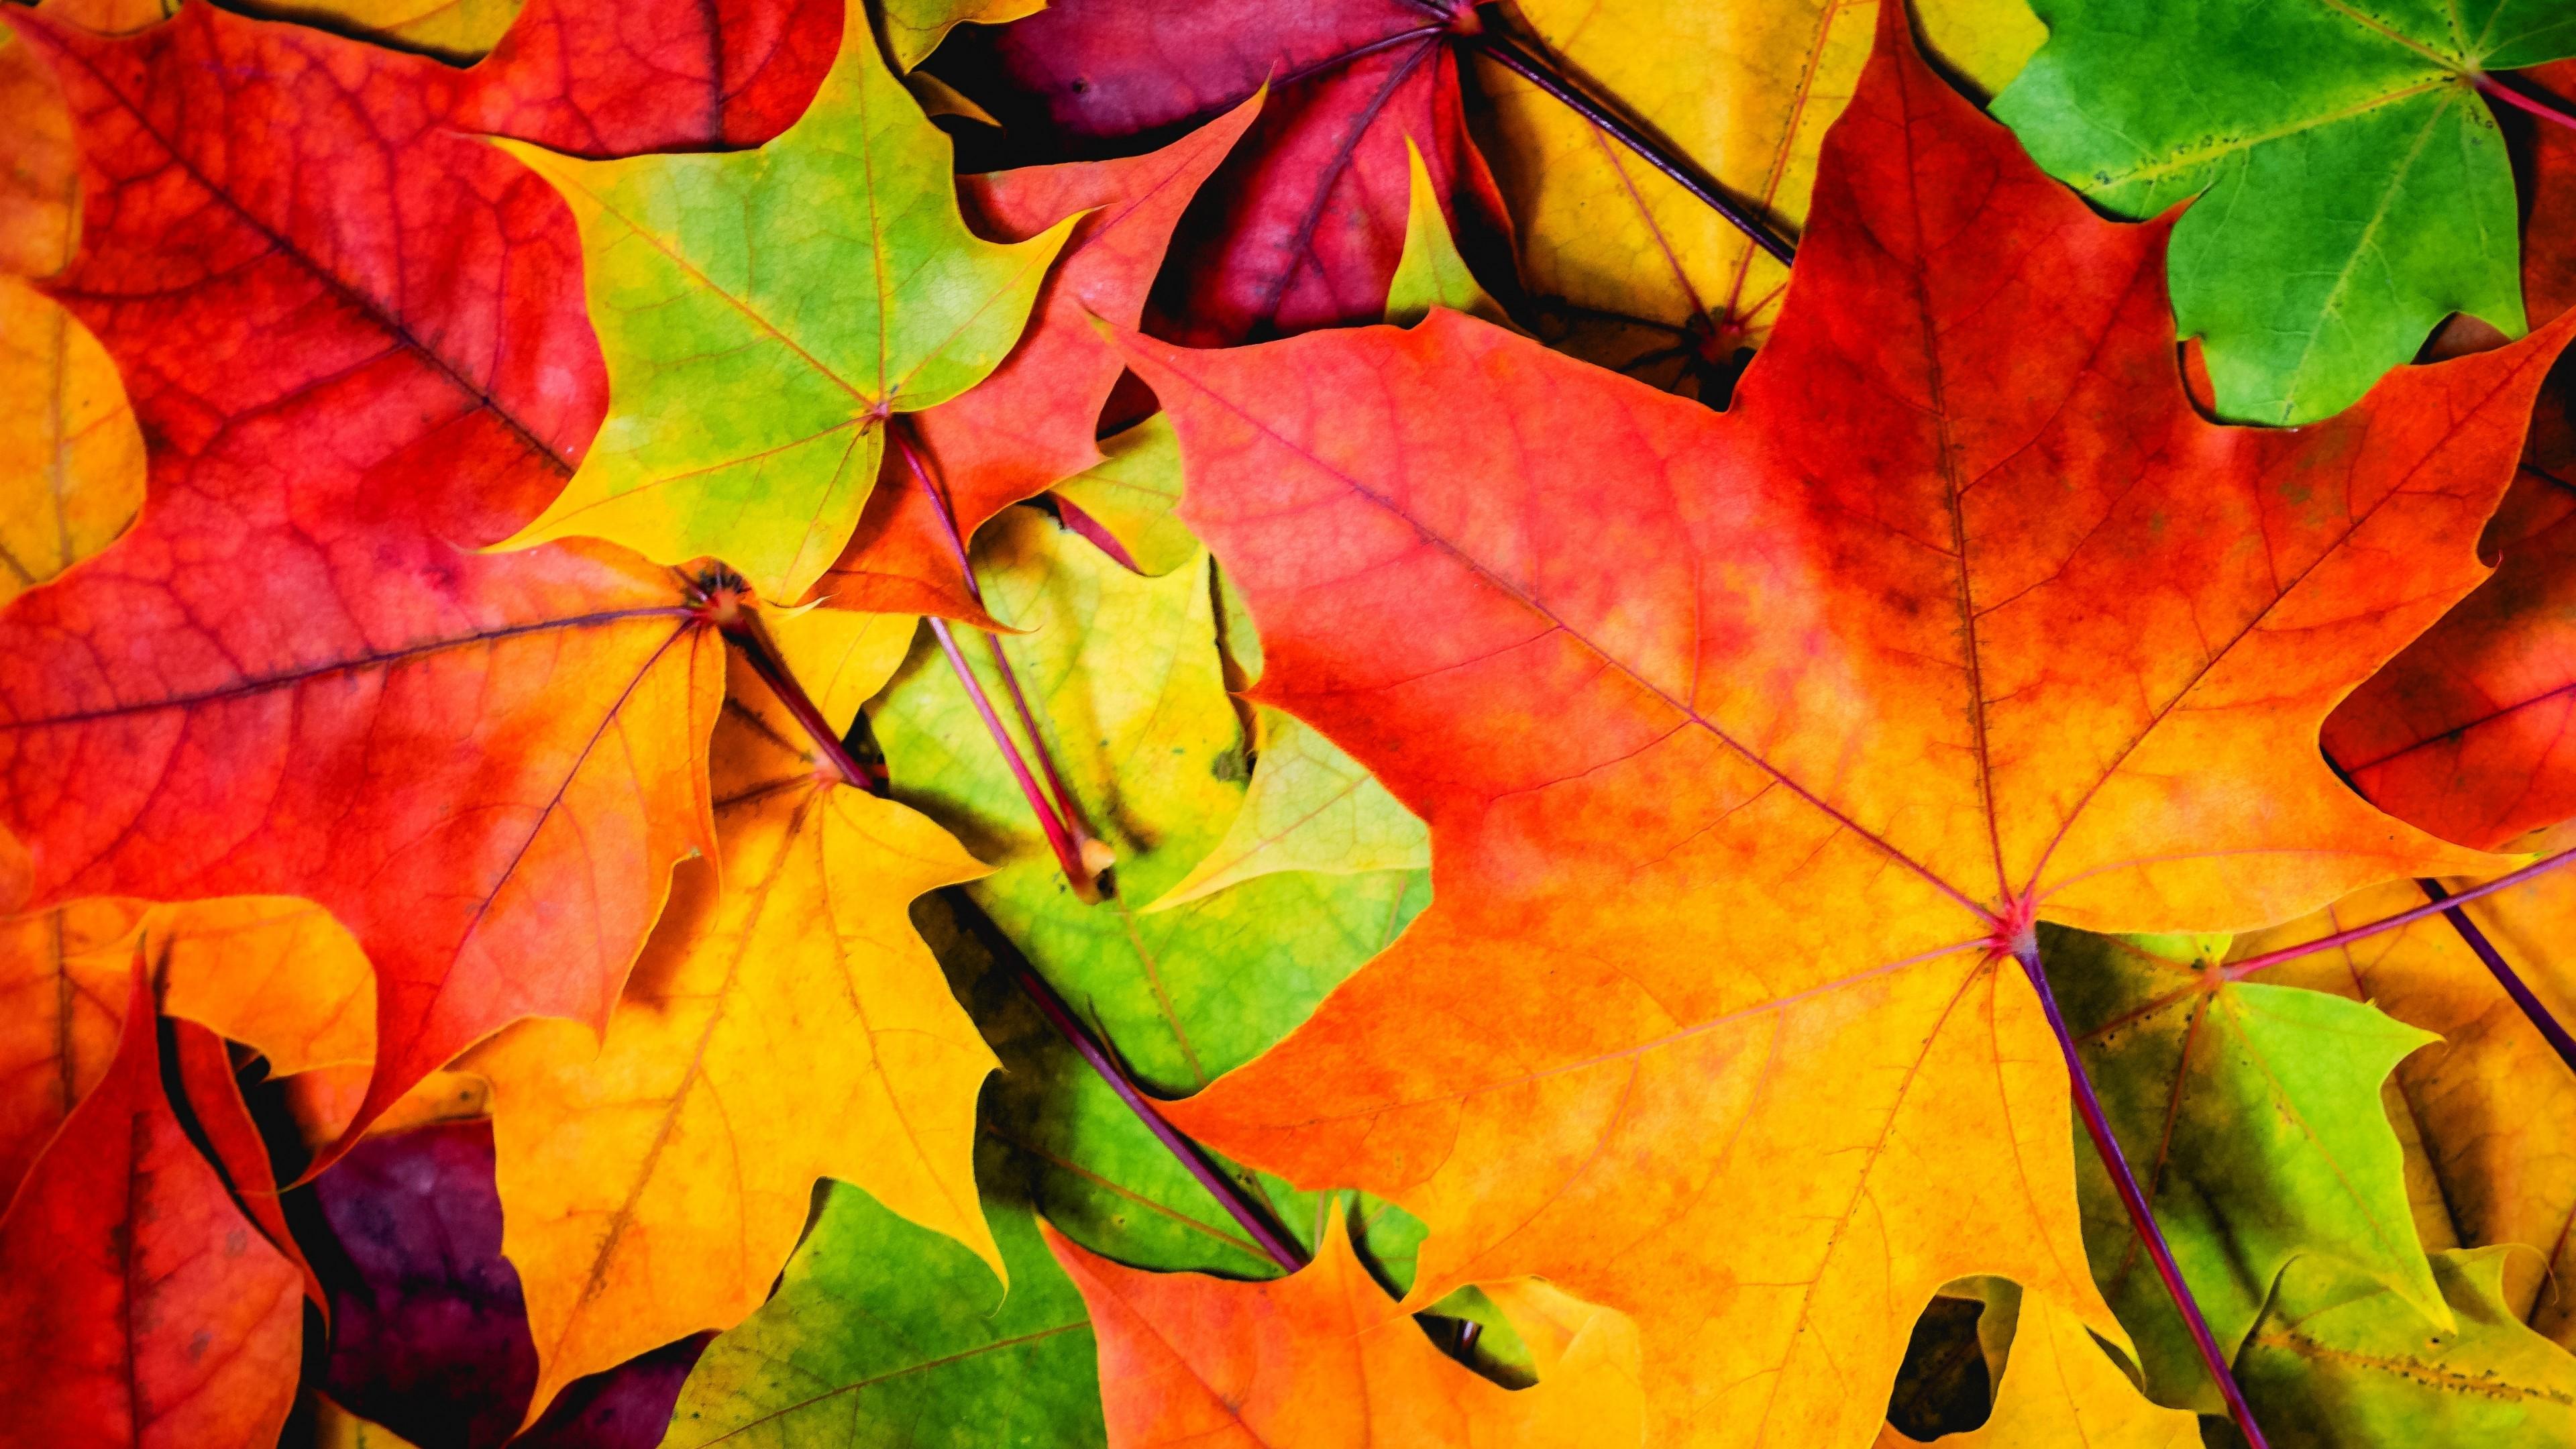 Hd Thanksgiving Wallpaper Free Wallpaper Leaves 5k 4k Wallpaper 8k Colorful Autumn